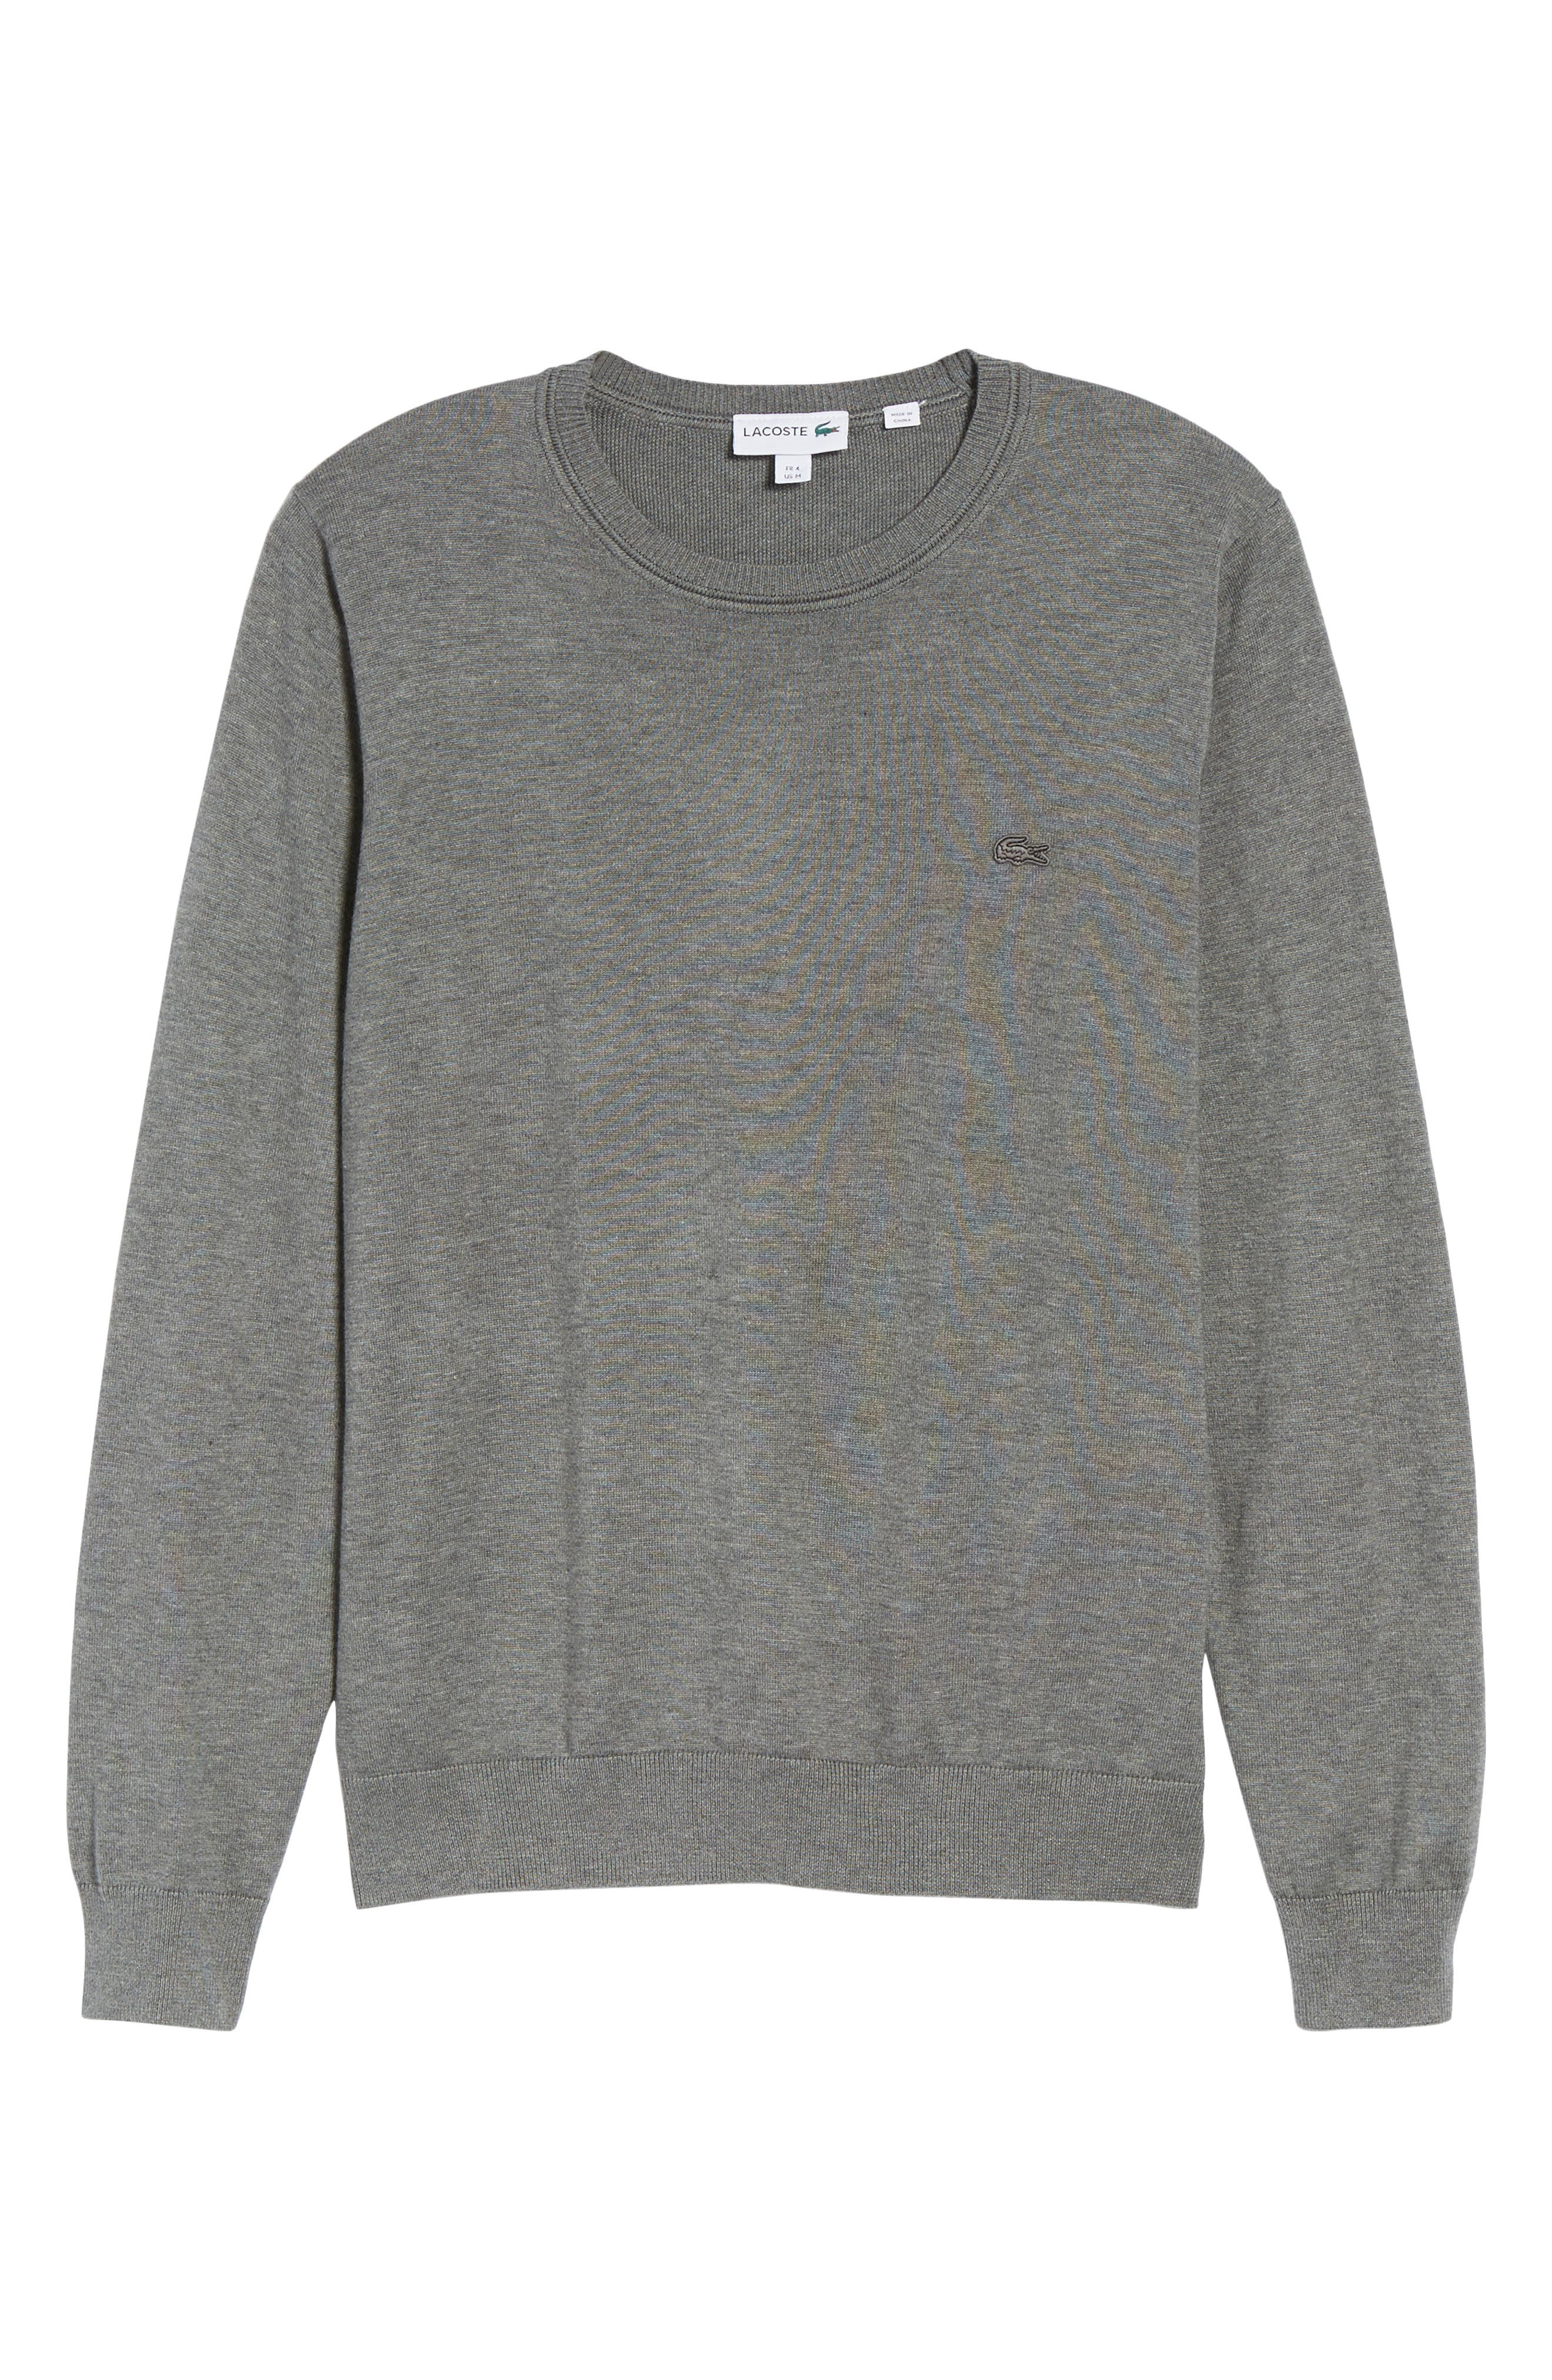 Jersey Knit Crewneck Sweater,                             Alternate thumbnail 6, color,                             032